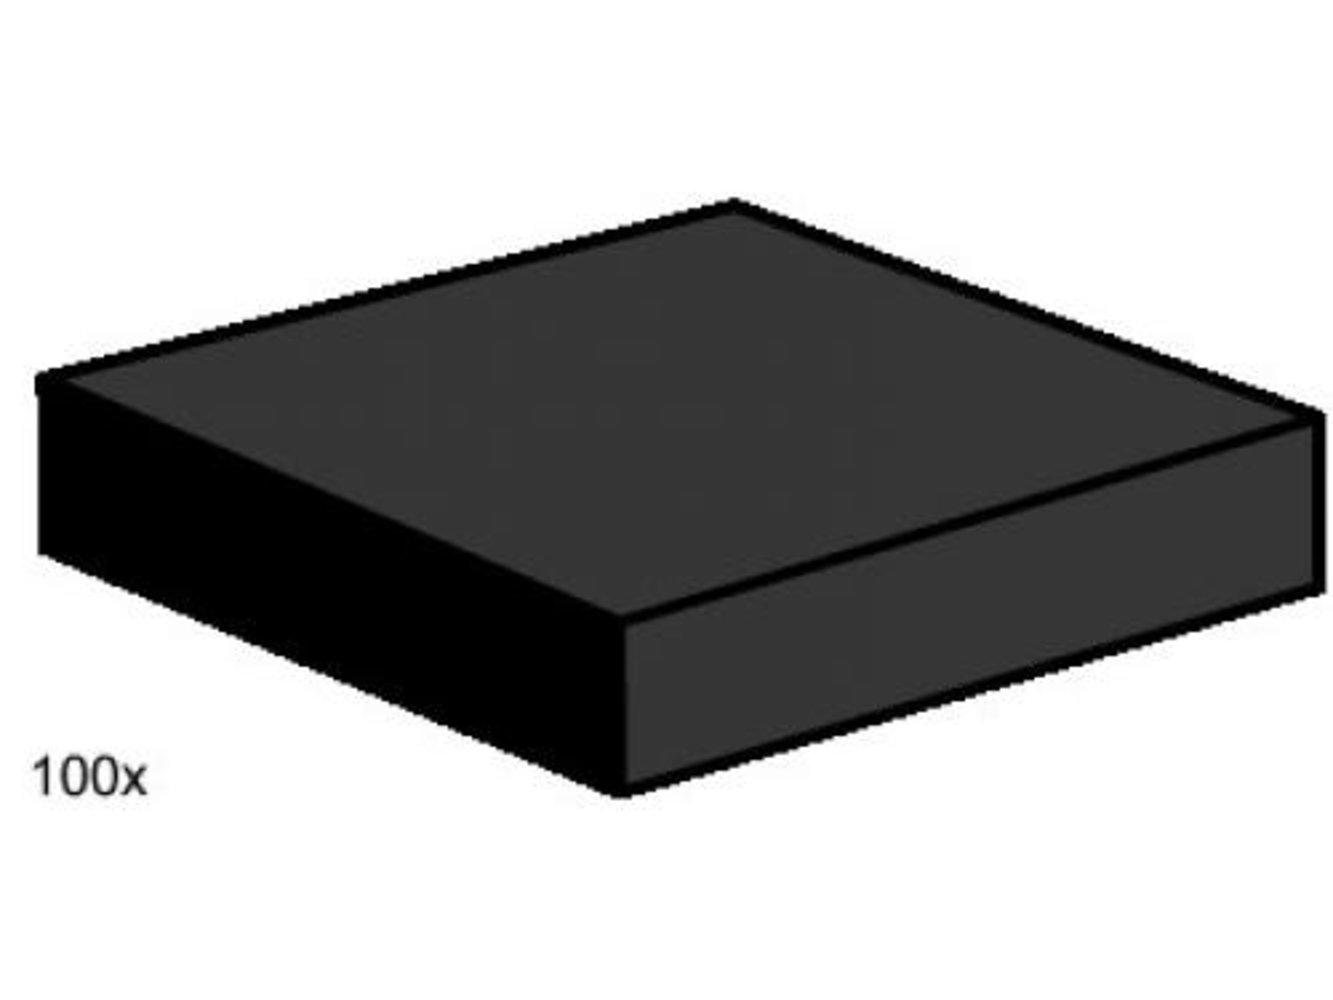 2 x 2 Black Smooth Tiles